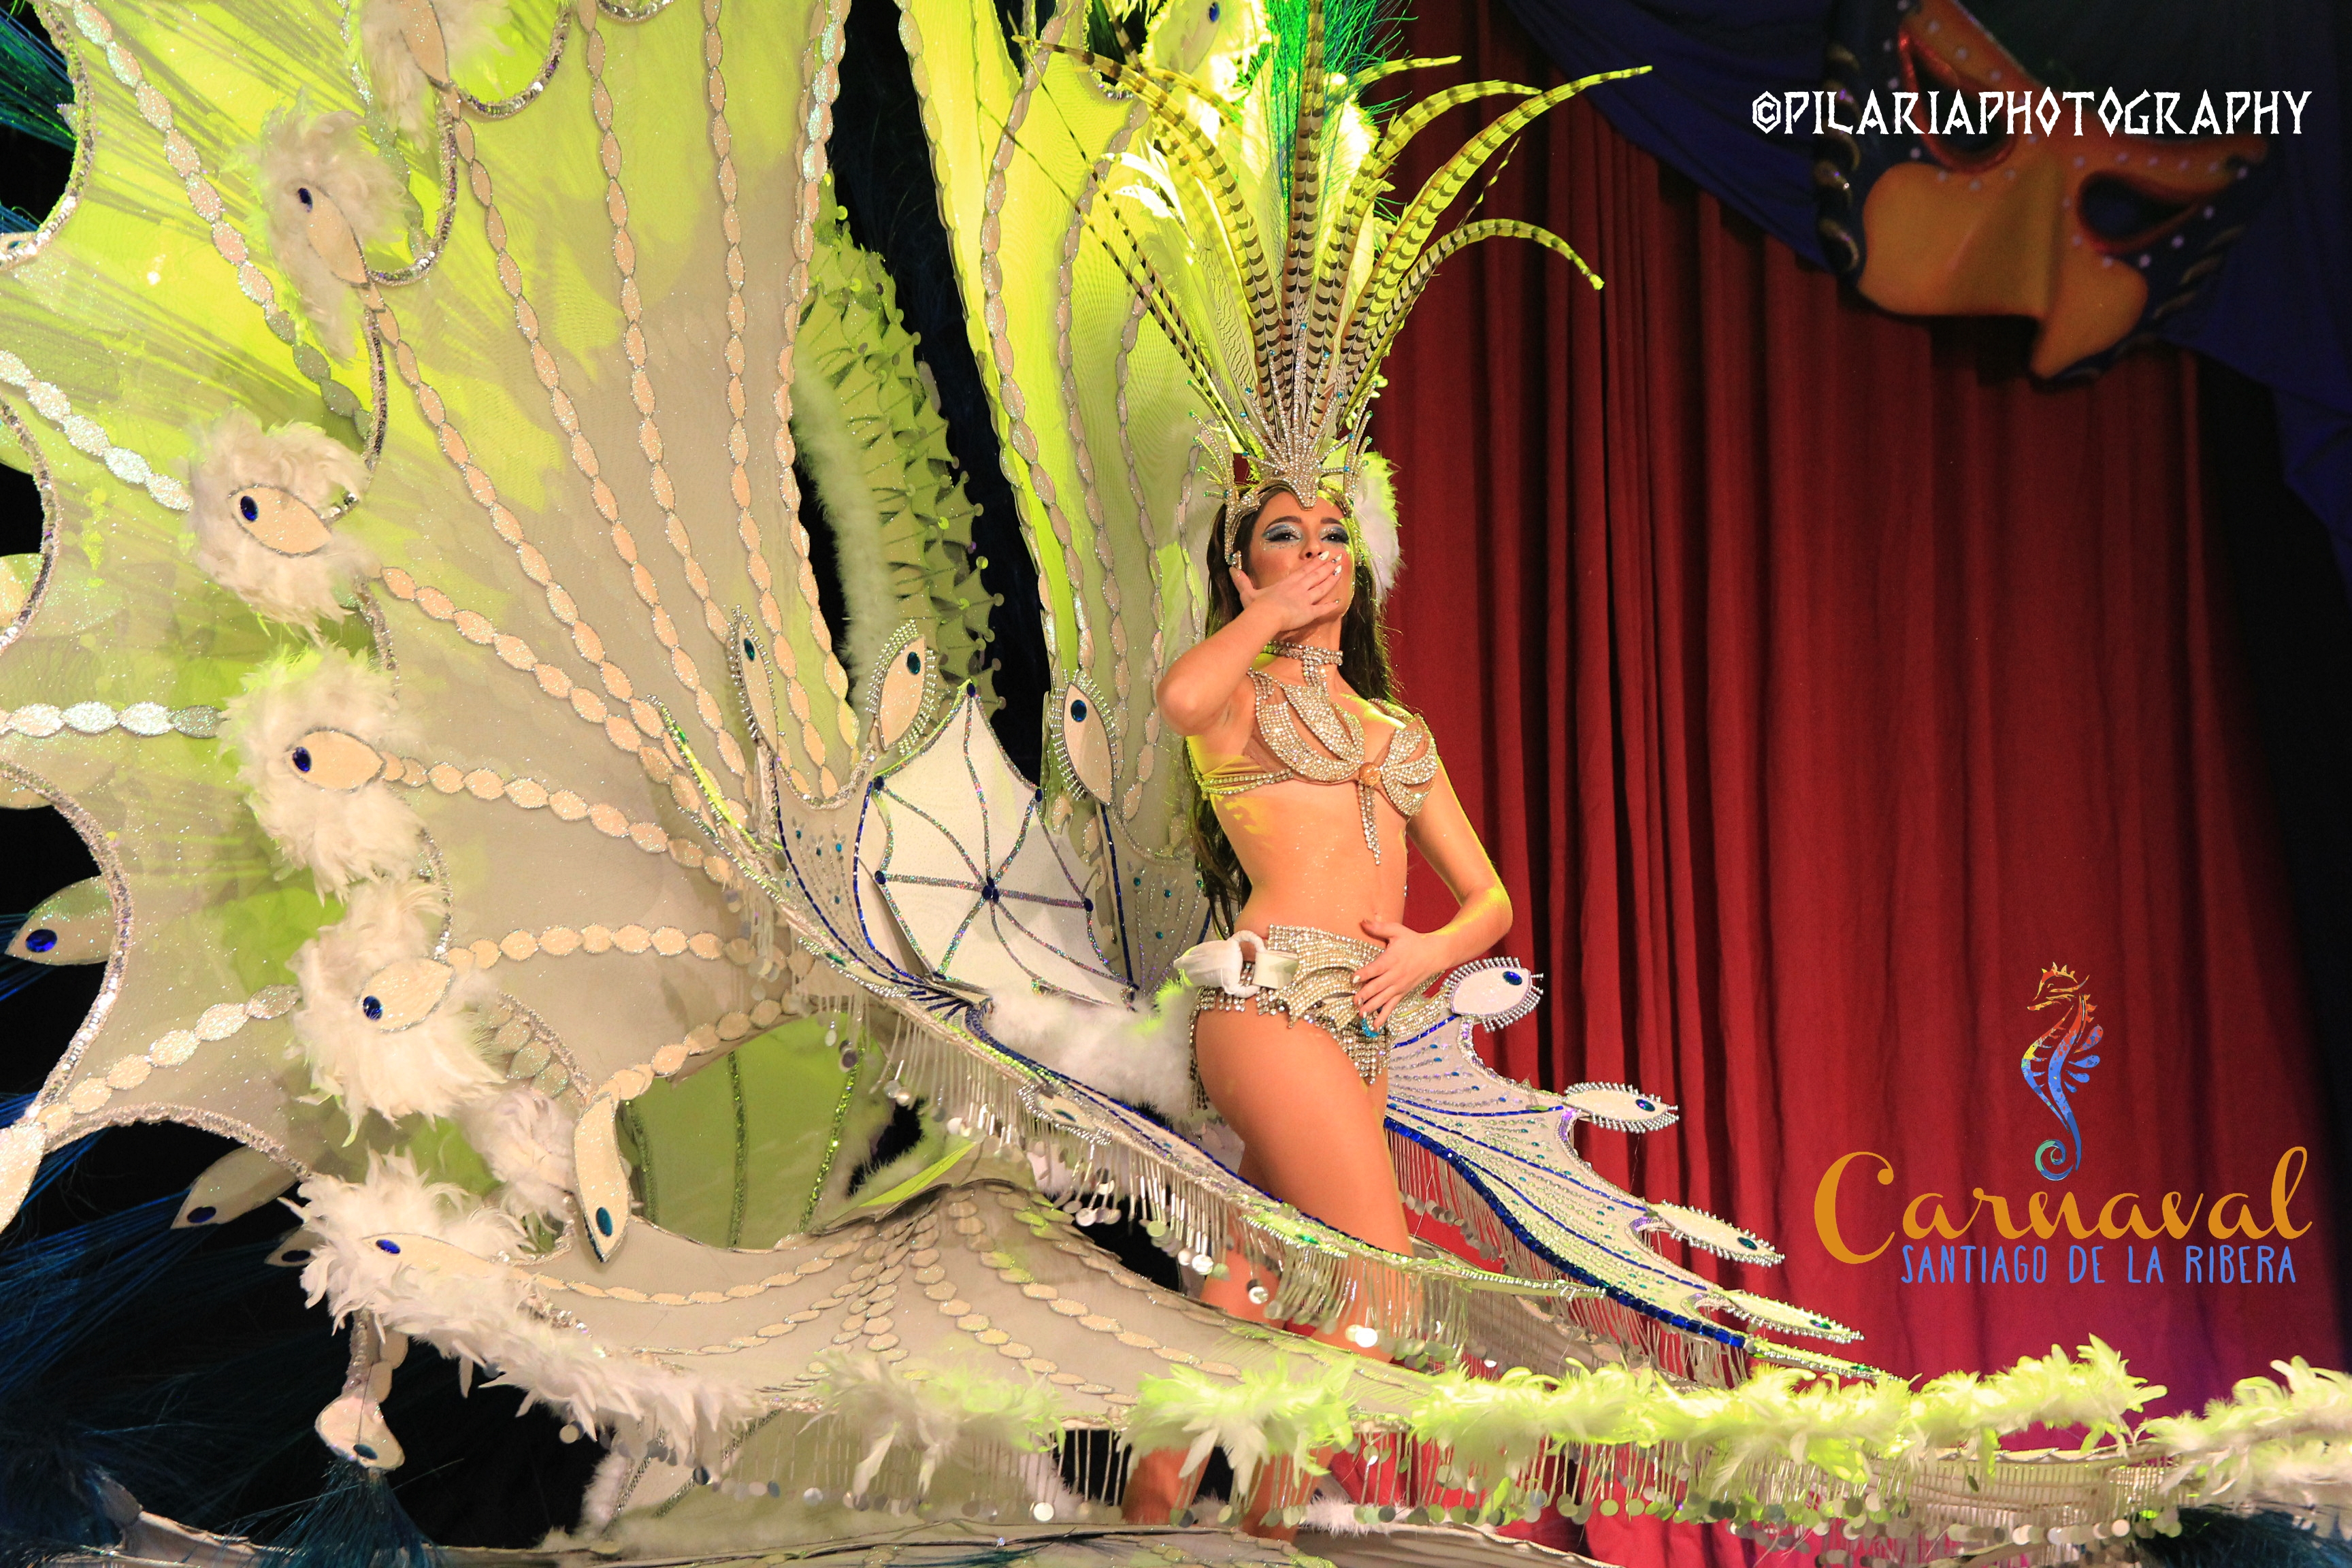 carnaval de la ribera